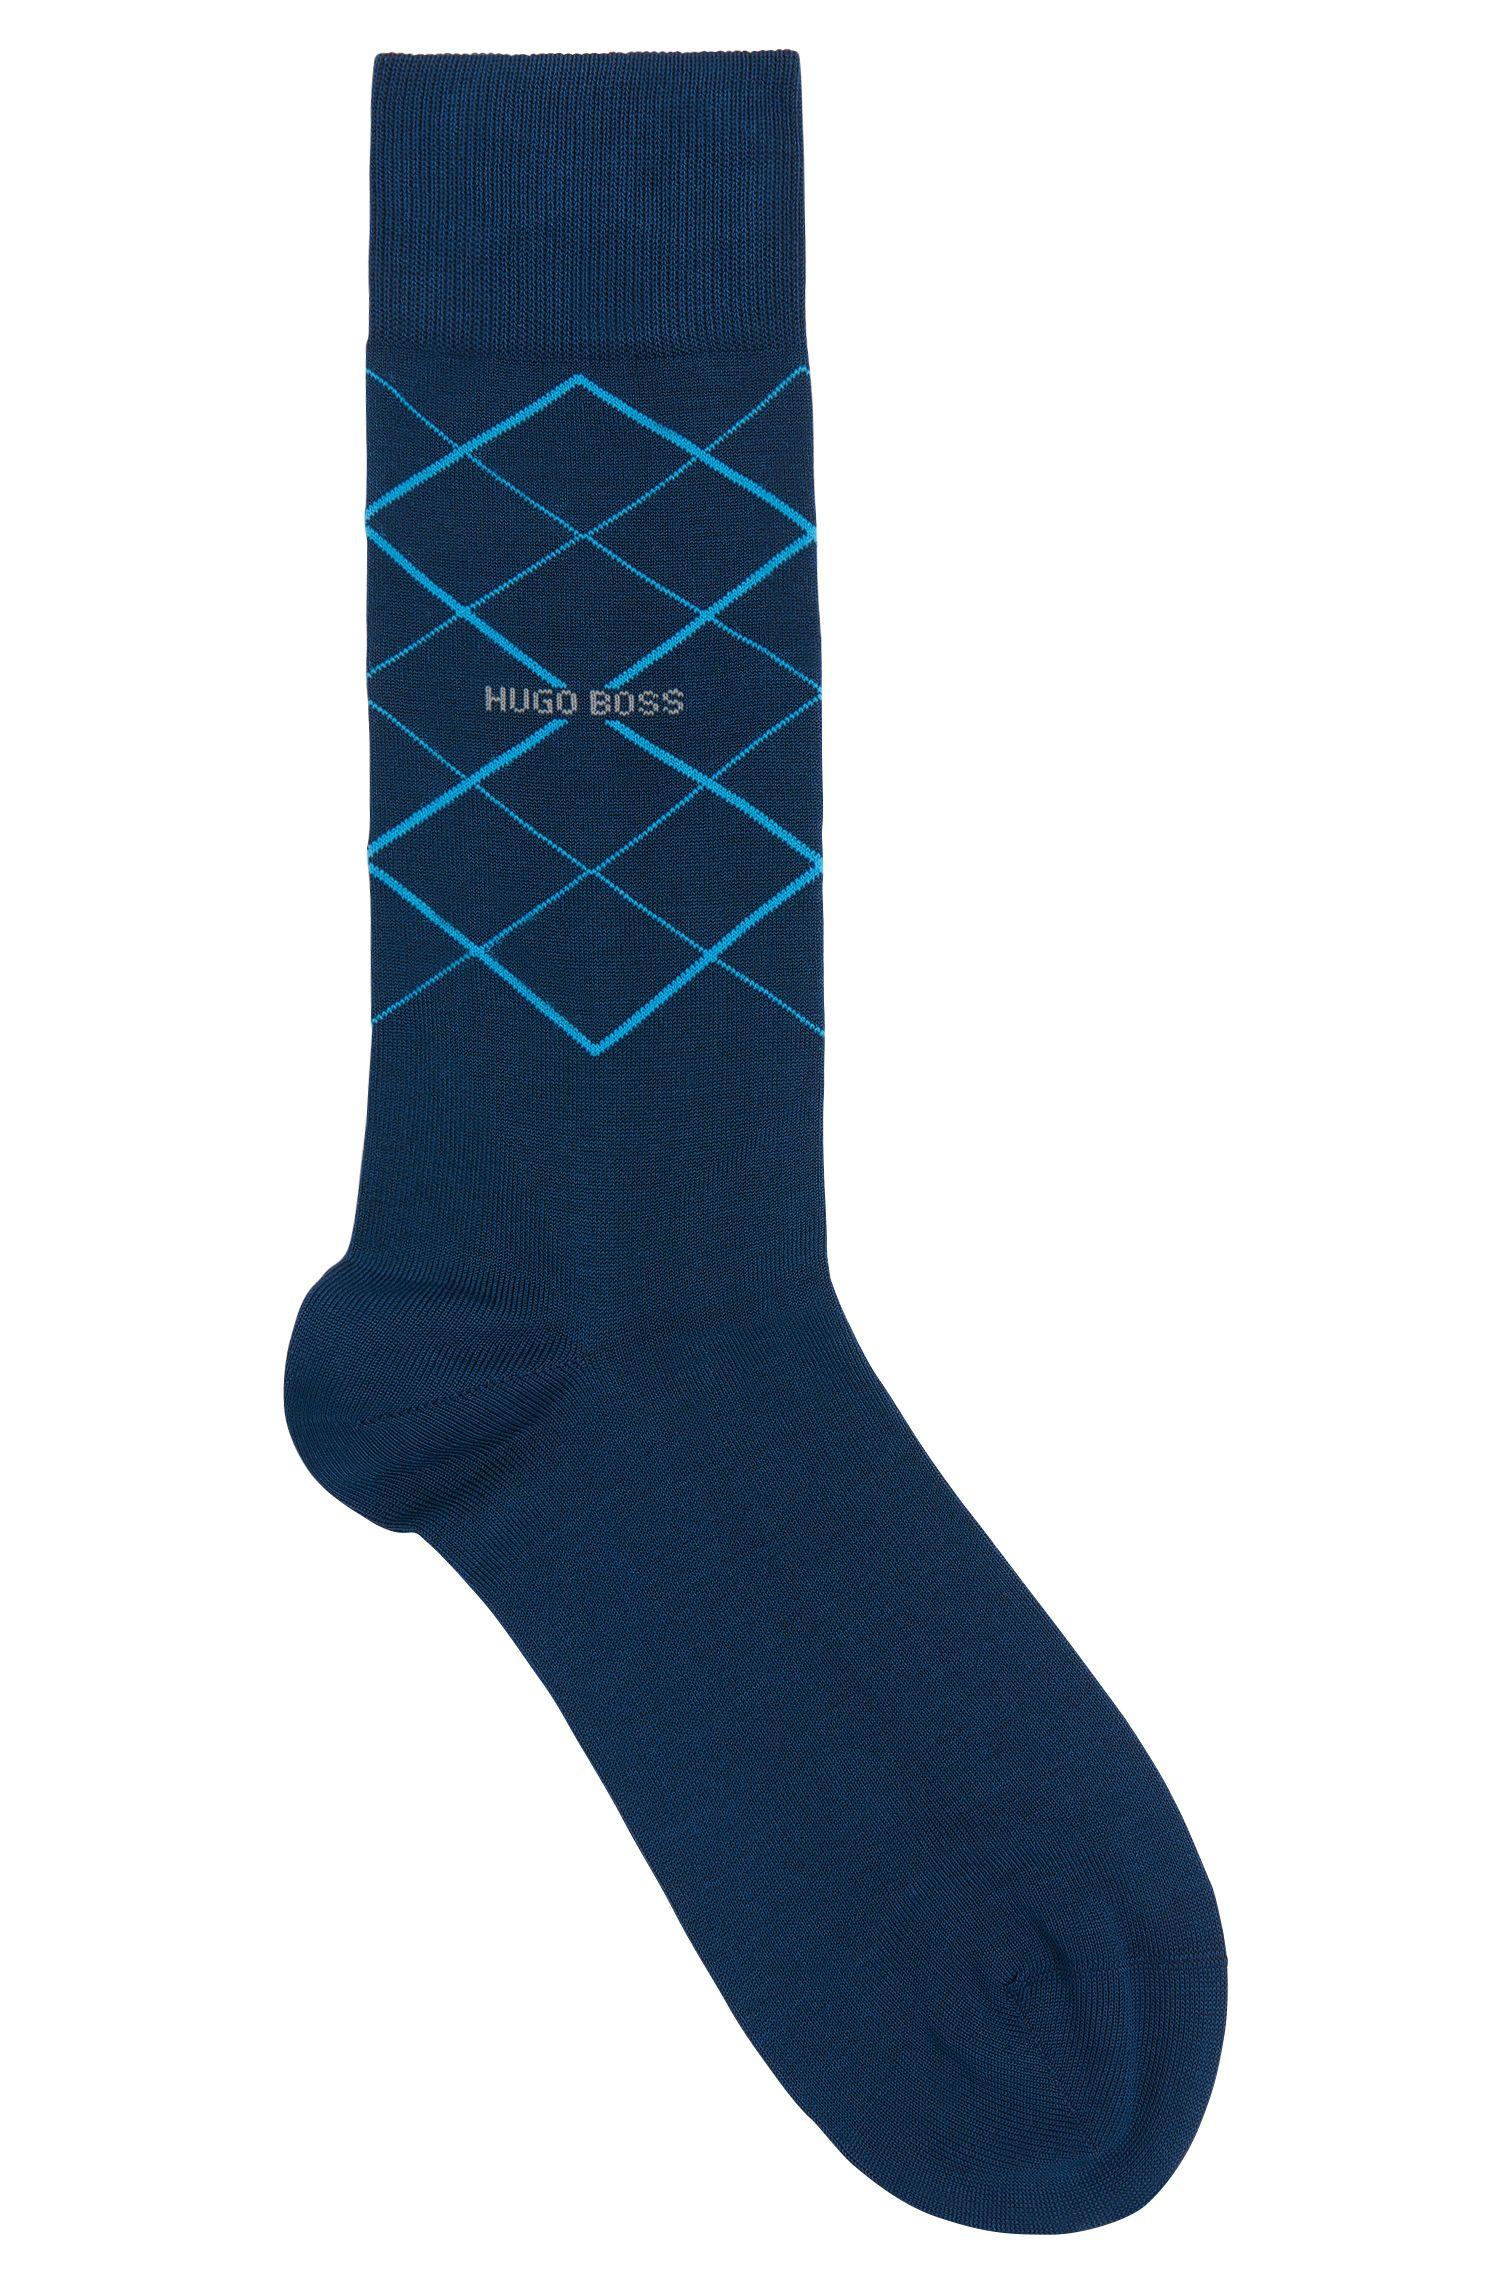 'RS Design US'   Stretch Mercerized Cotton Blend Socks